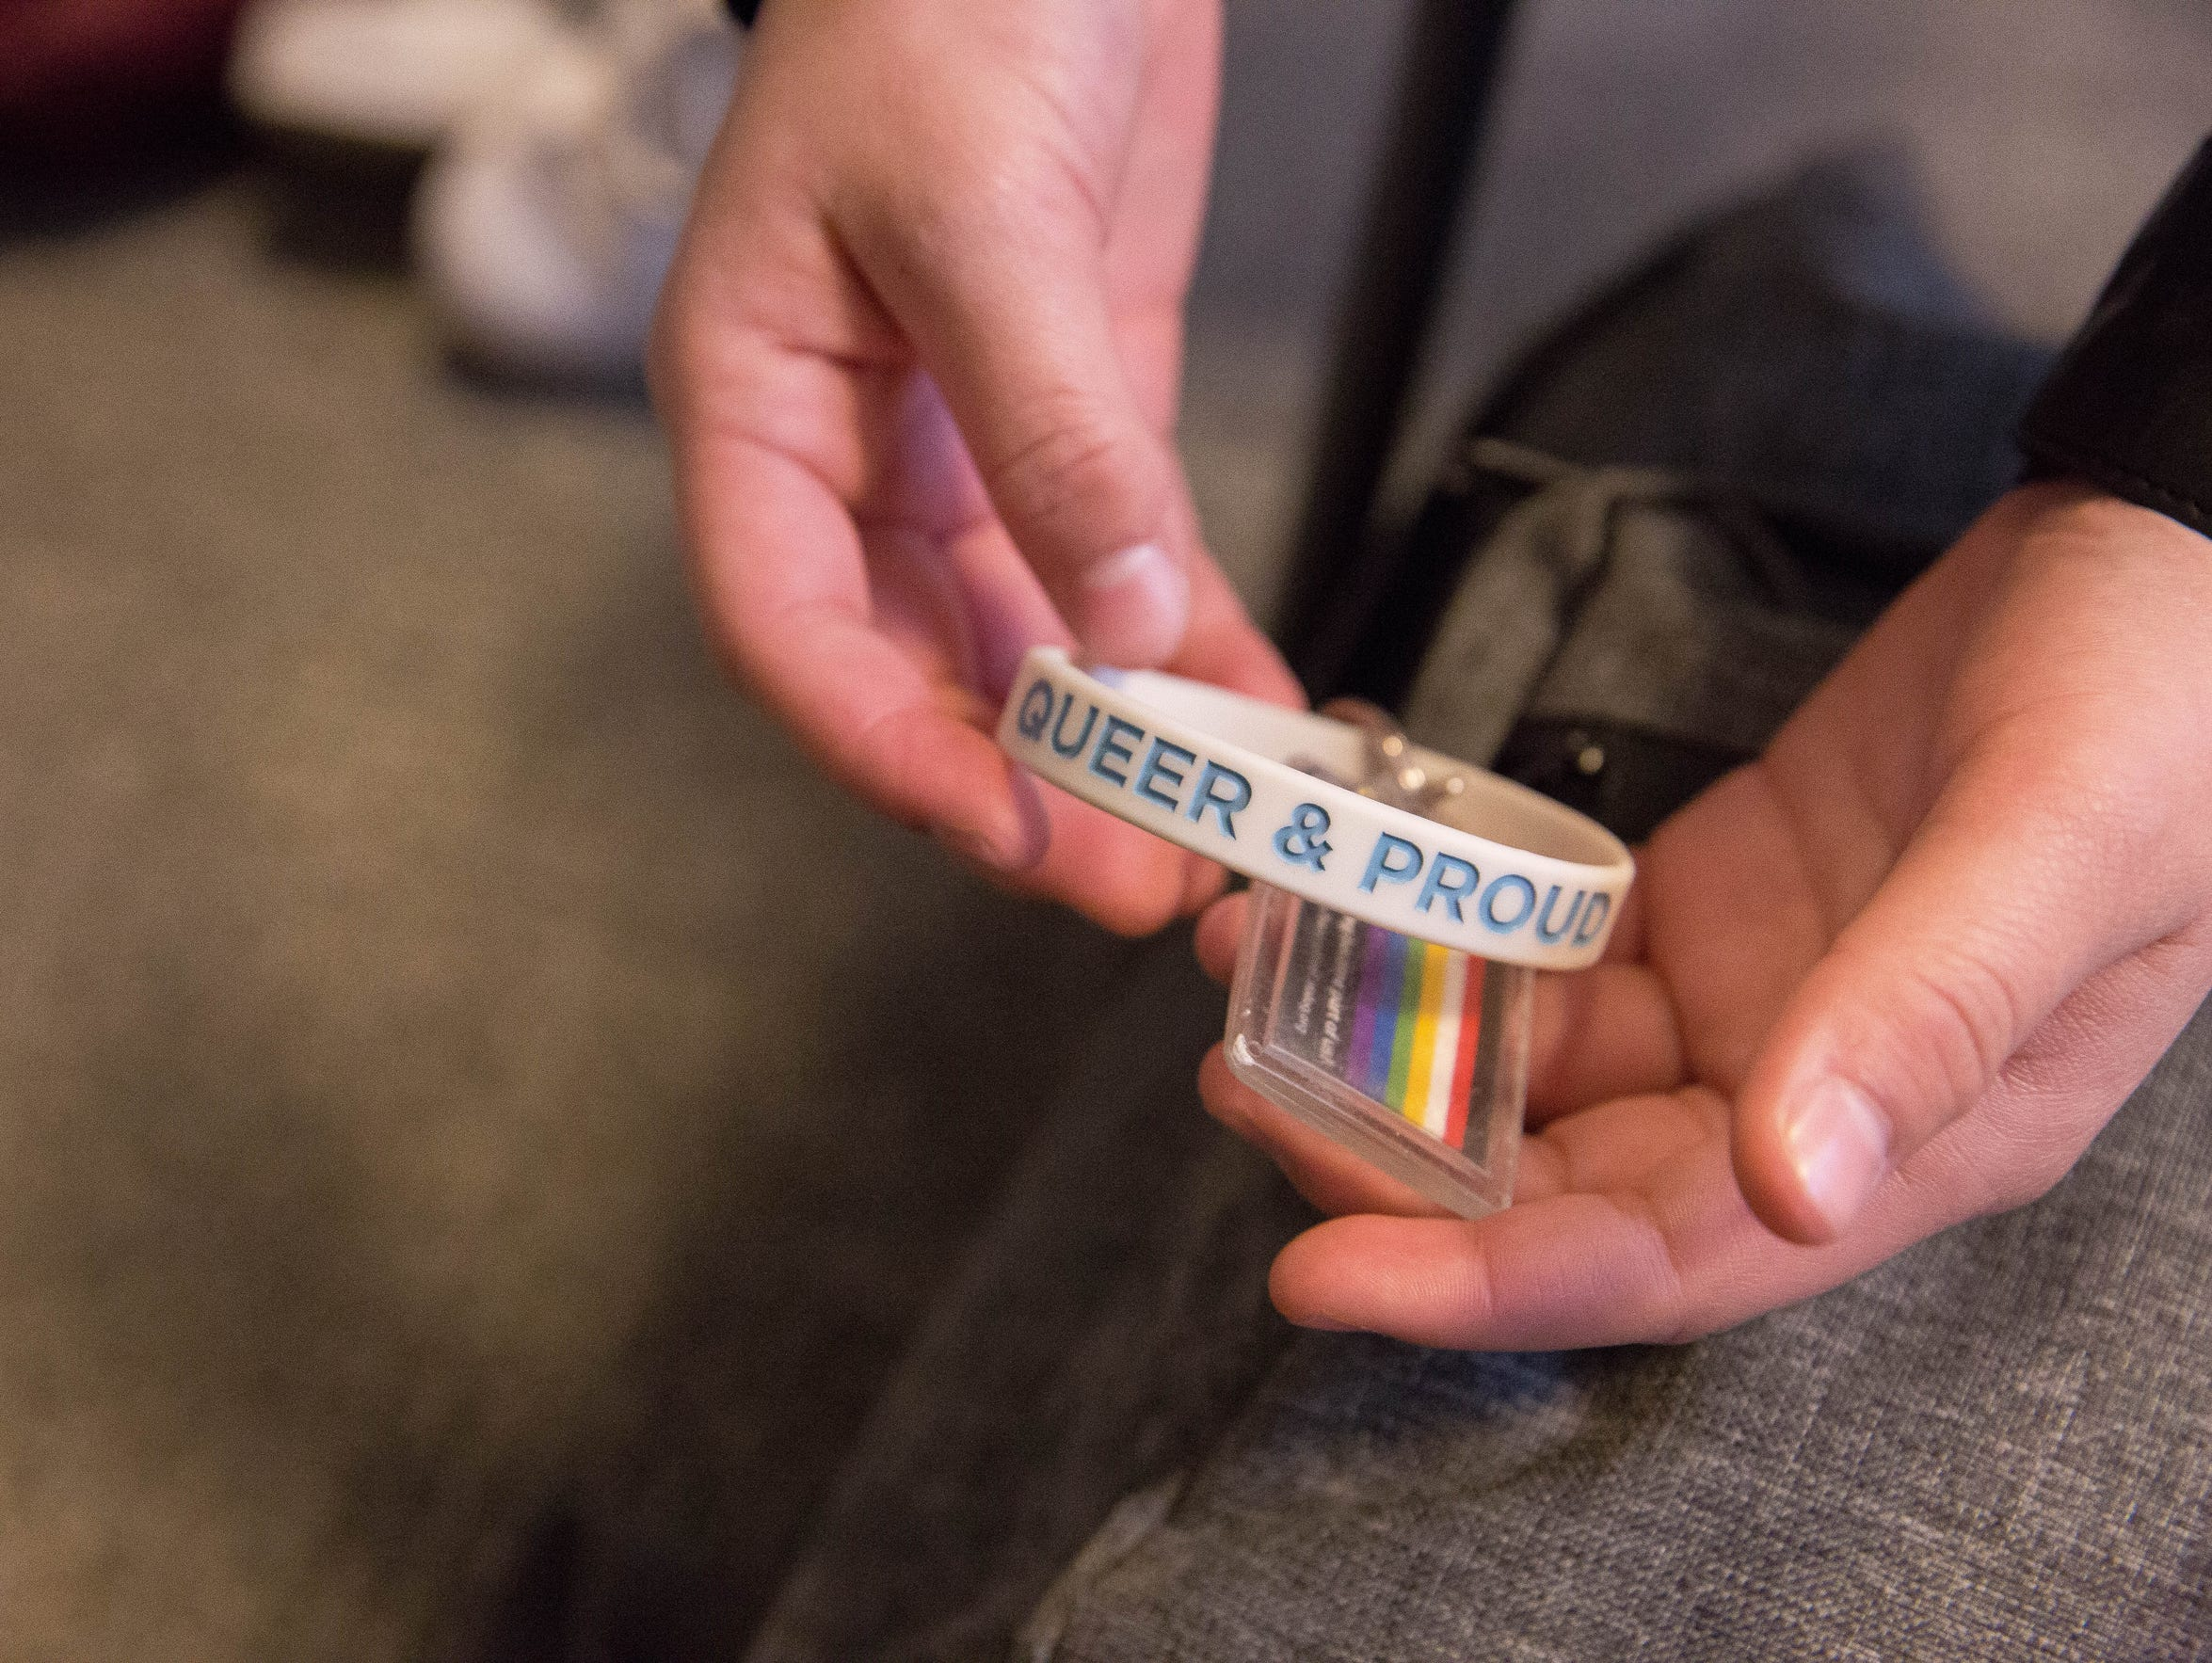 Gabe, a local transgender teen, shows off a key chain